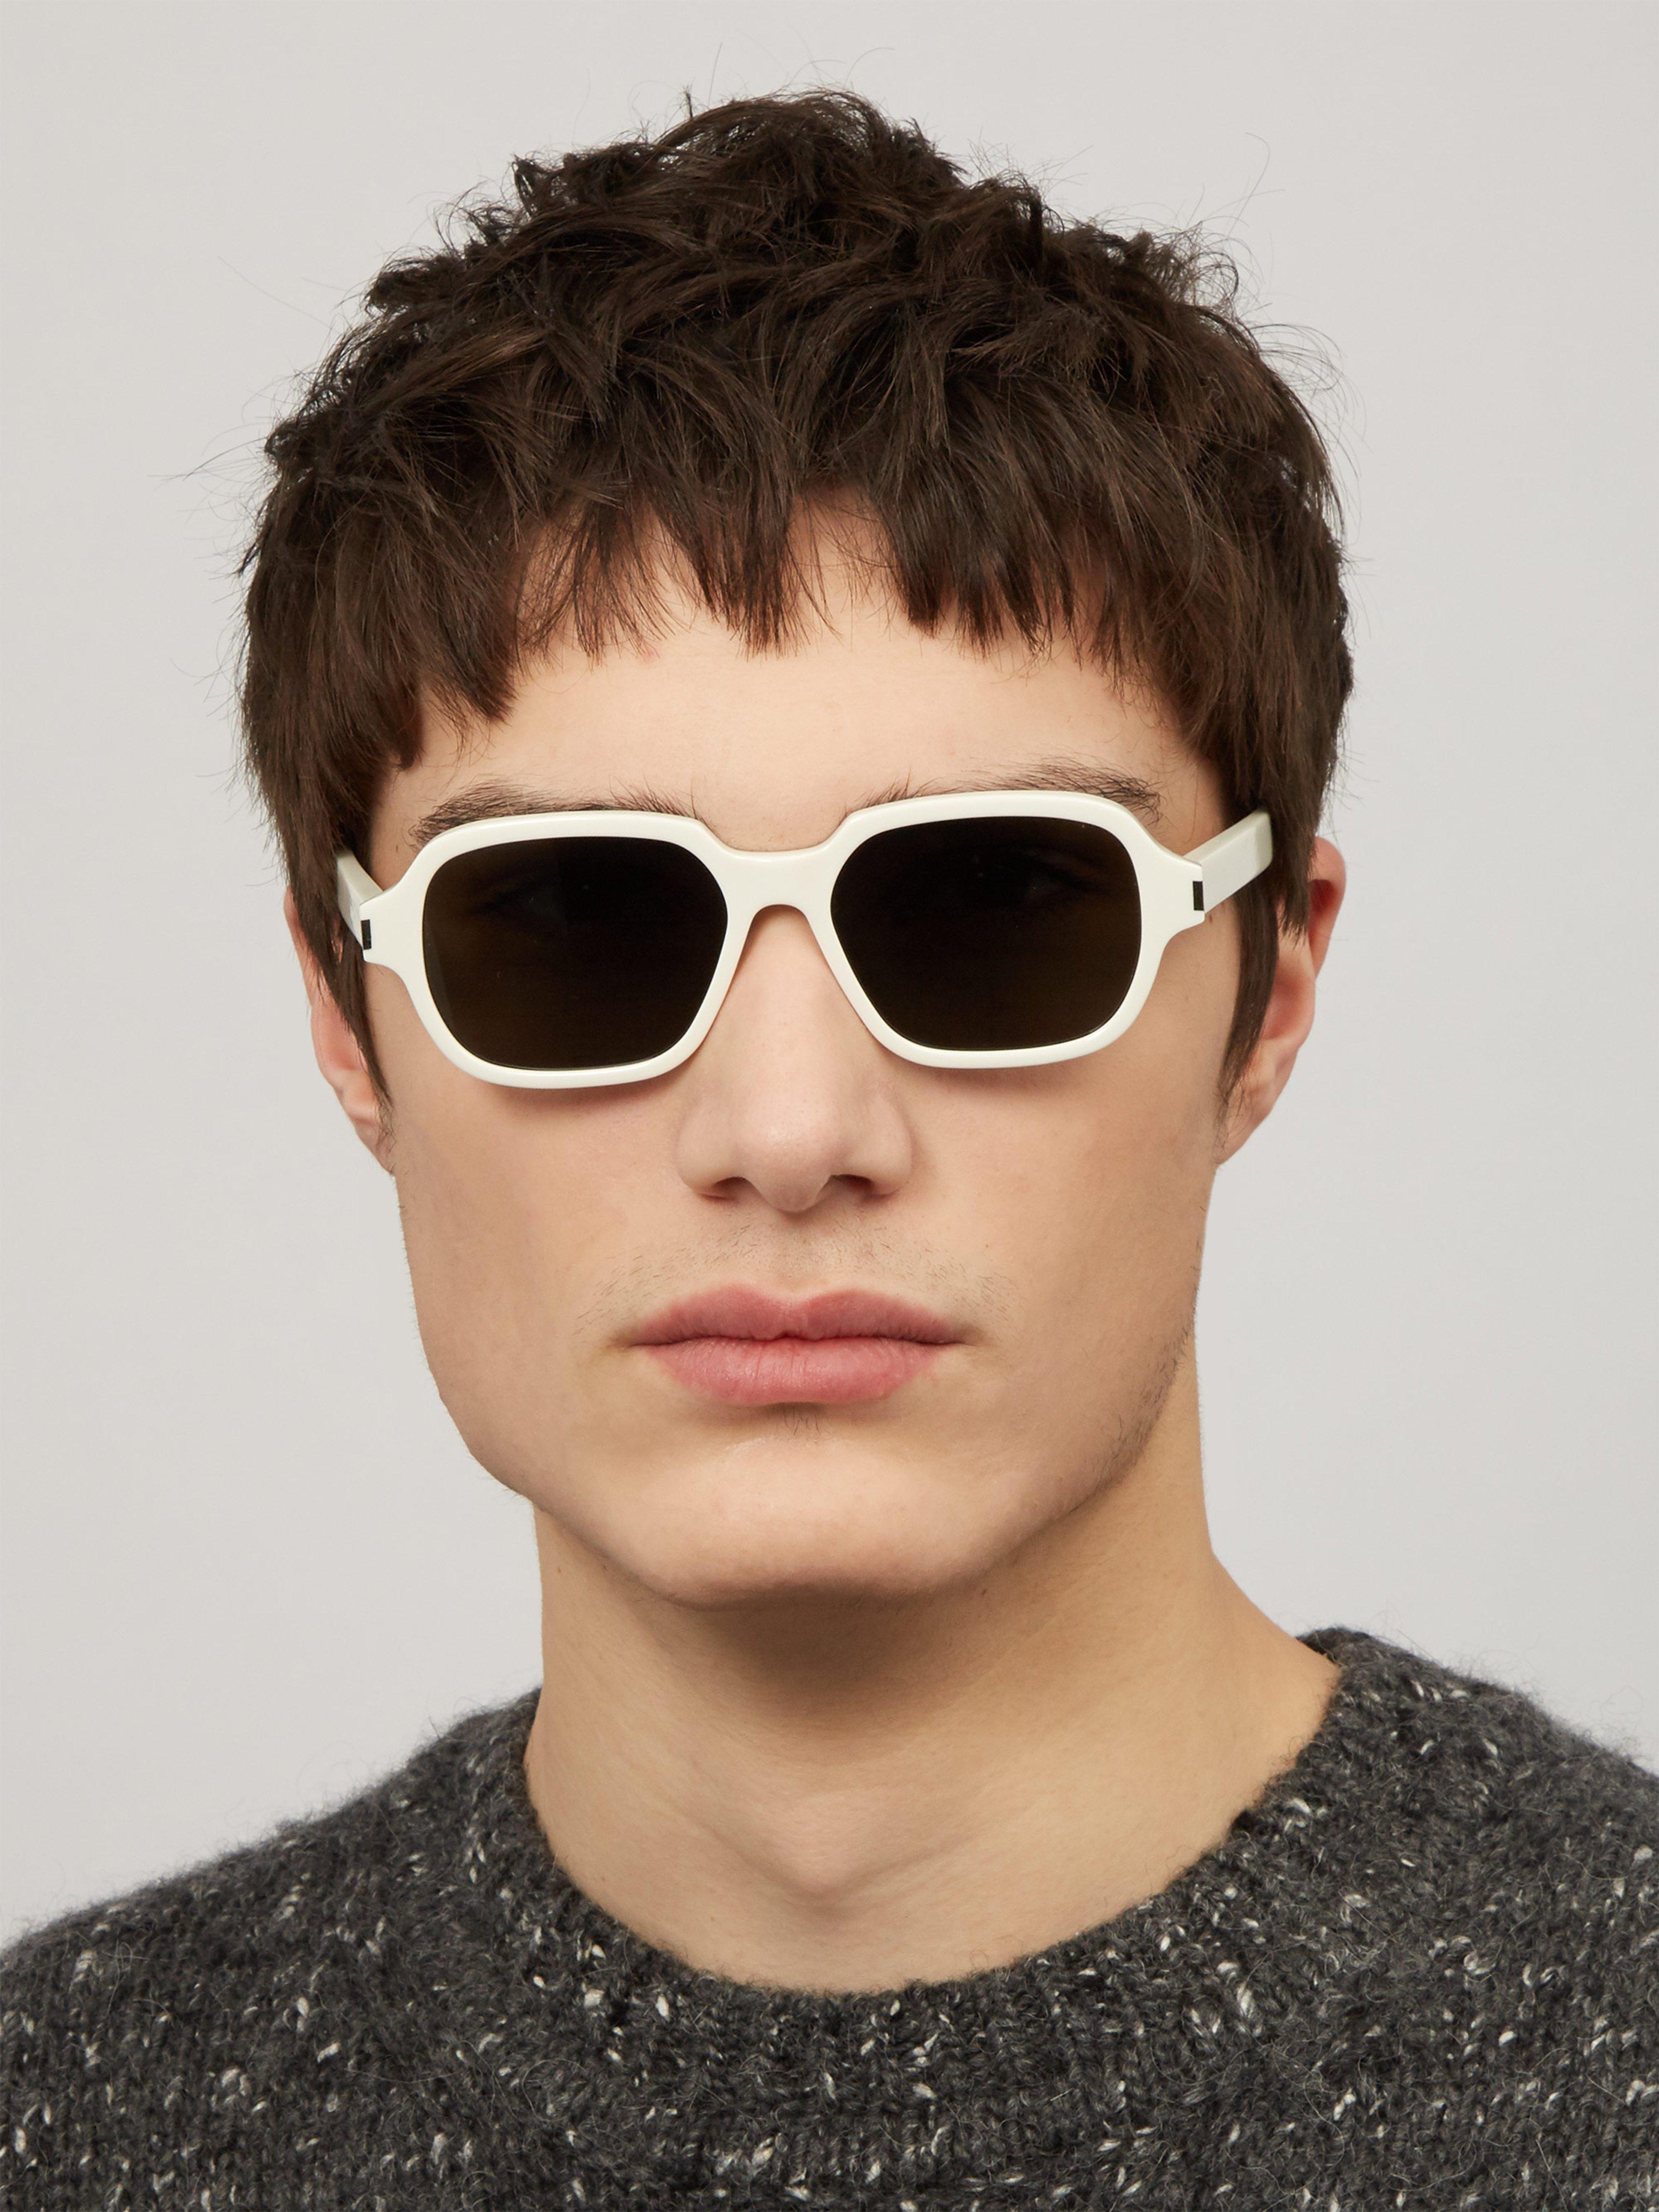 956659a31ba2 Saint Laurent D Frame Acetate Sunglasses in White for Men - Lyst